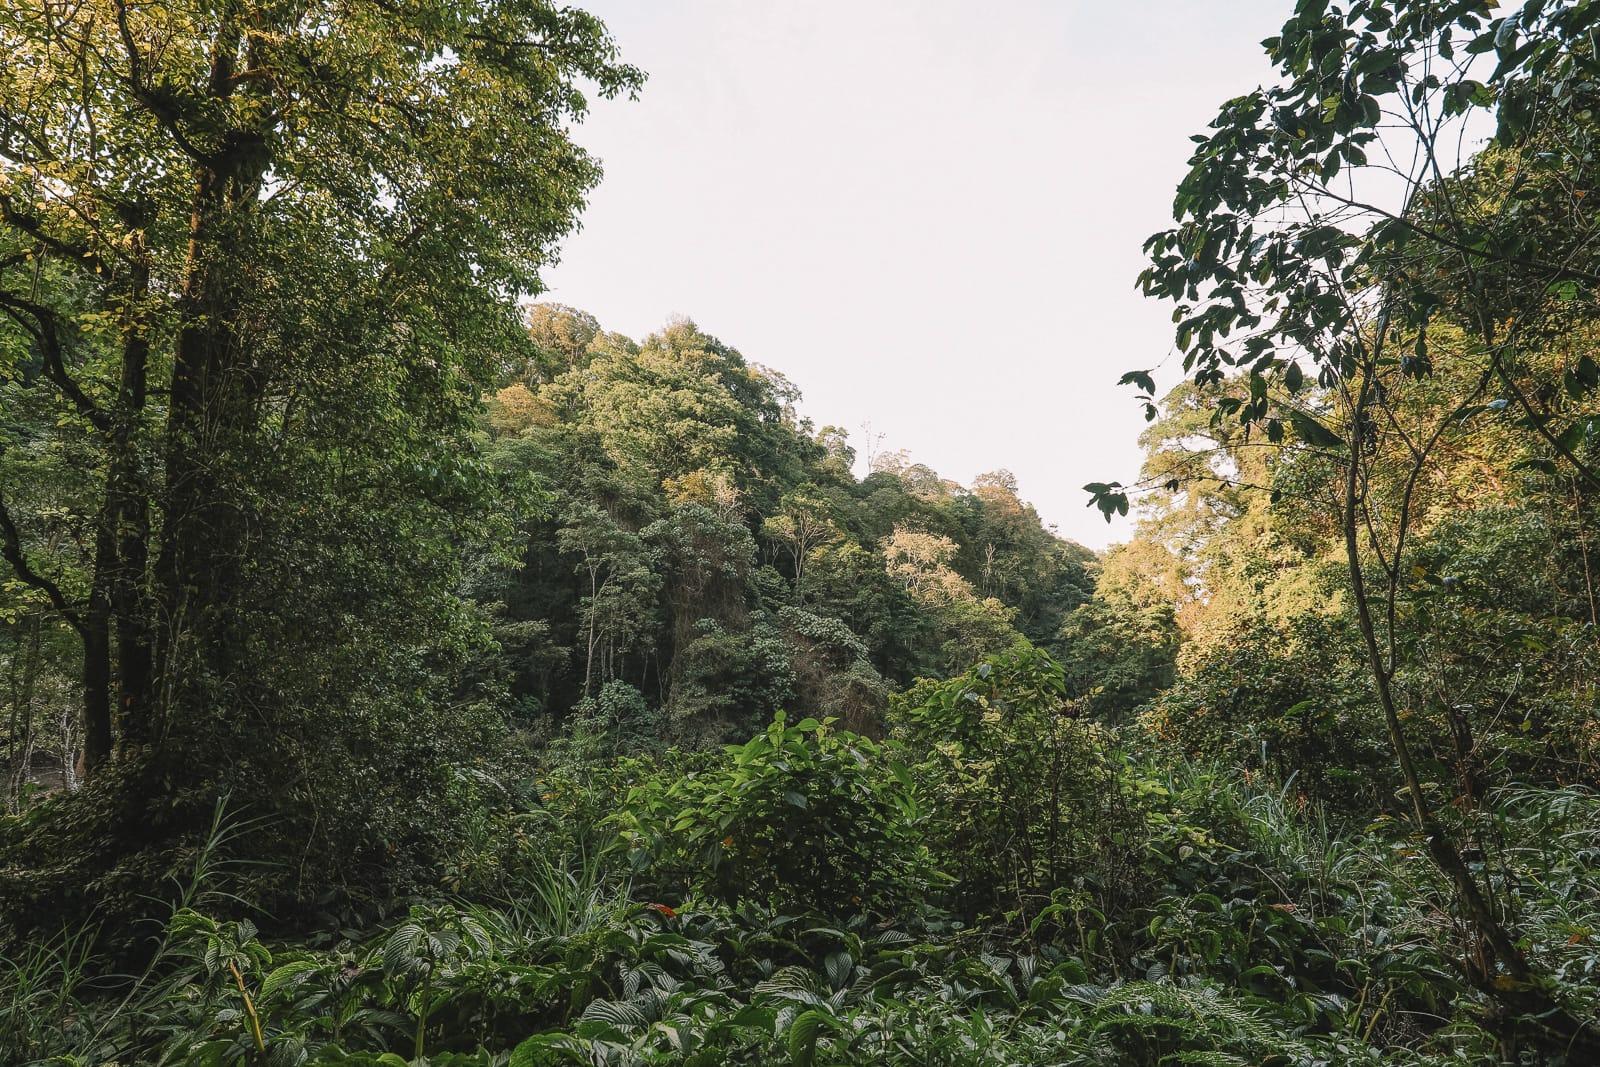 The Amazing Banyumala Twin Waterfalls In The Jungles Of Bali (10)